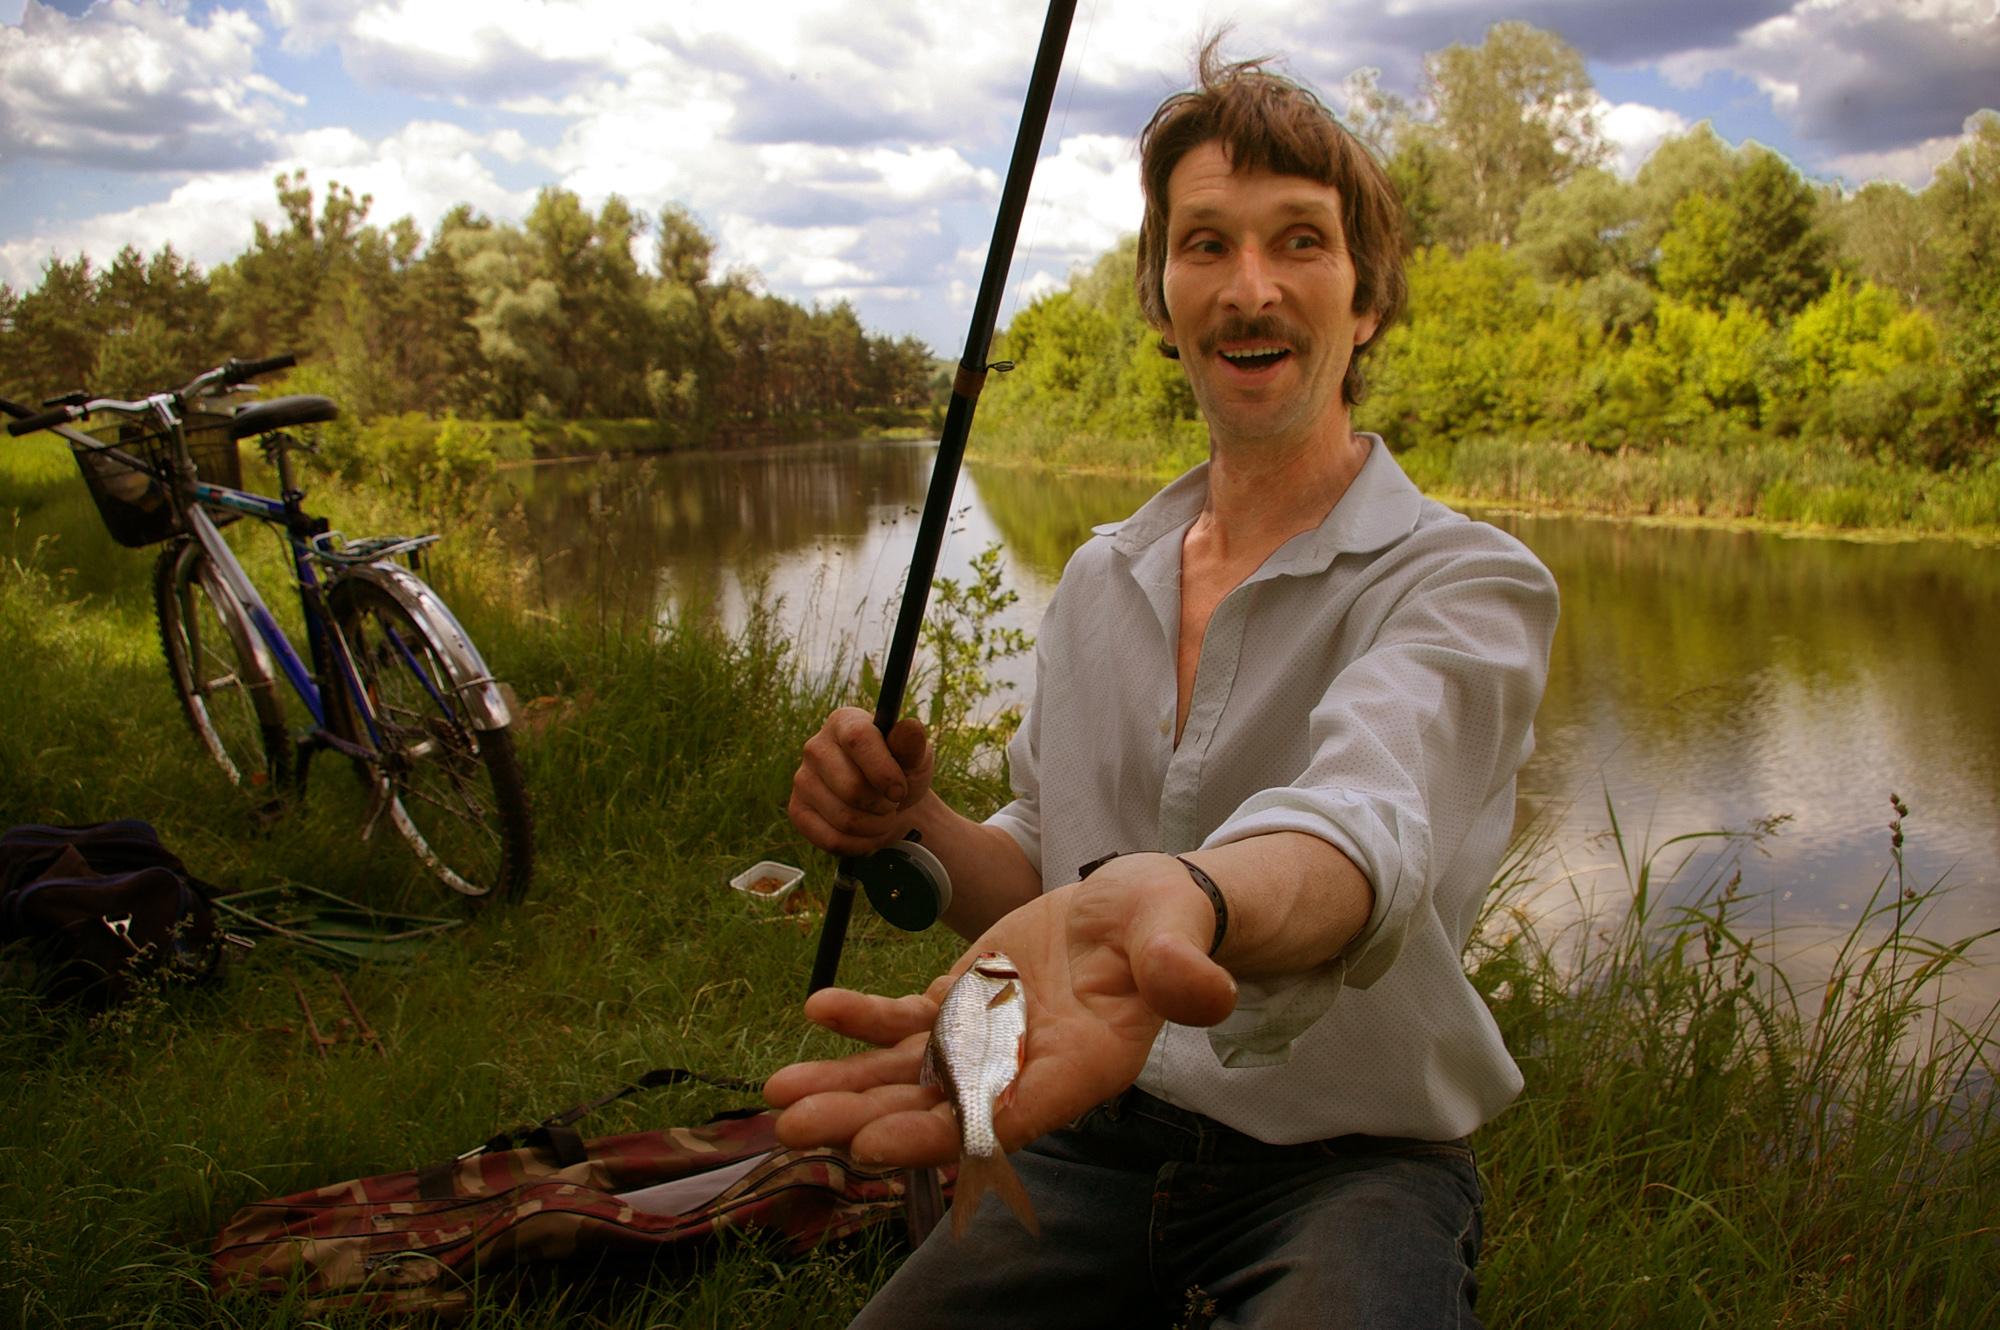 лучше на рыбалку или на дела